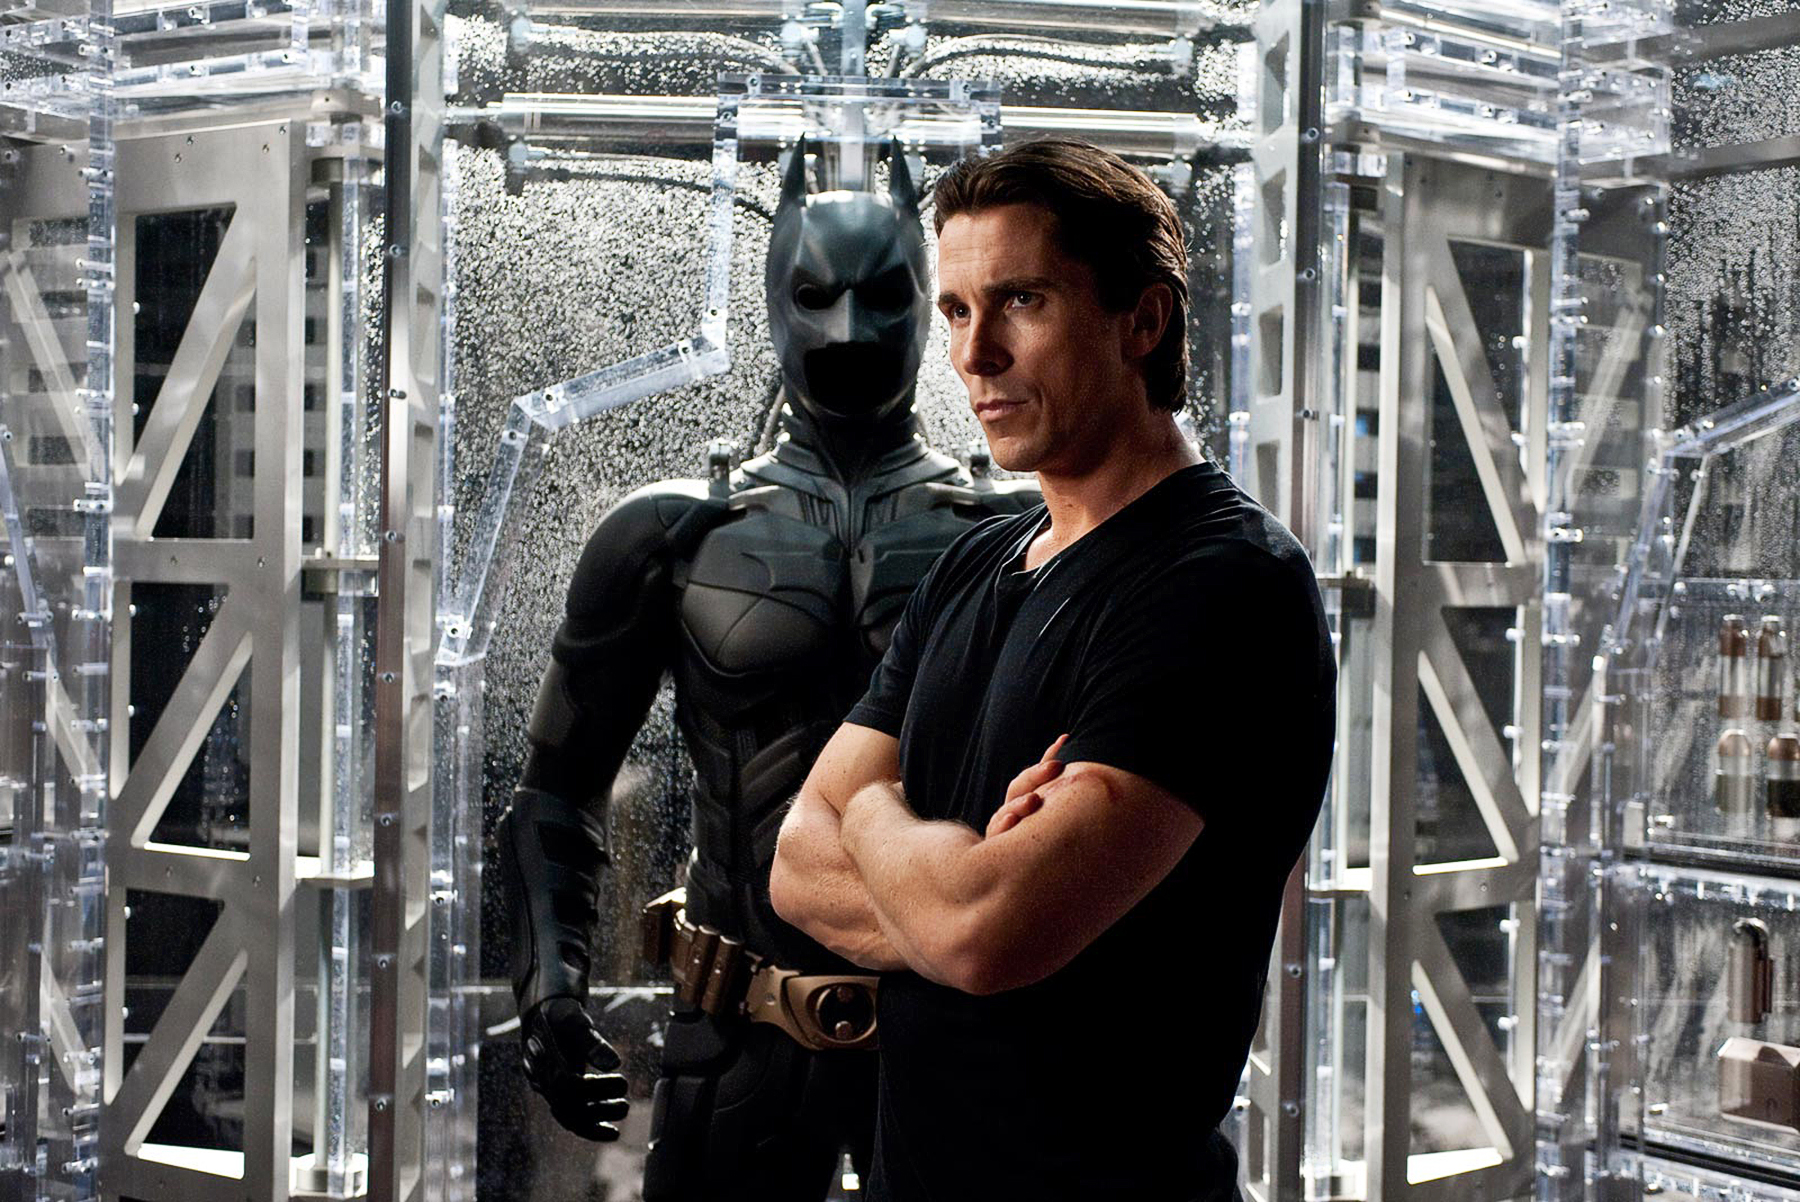 Christopher Nolan's Dark Knight Rises is a camp masterpiece